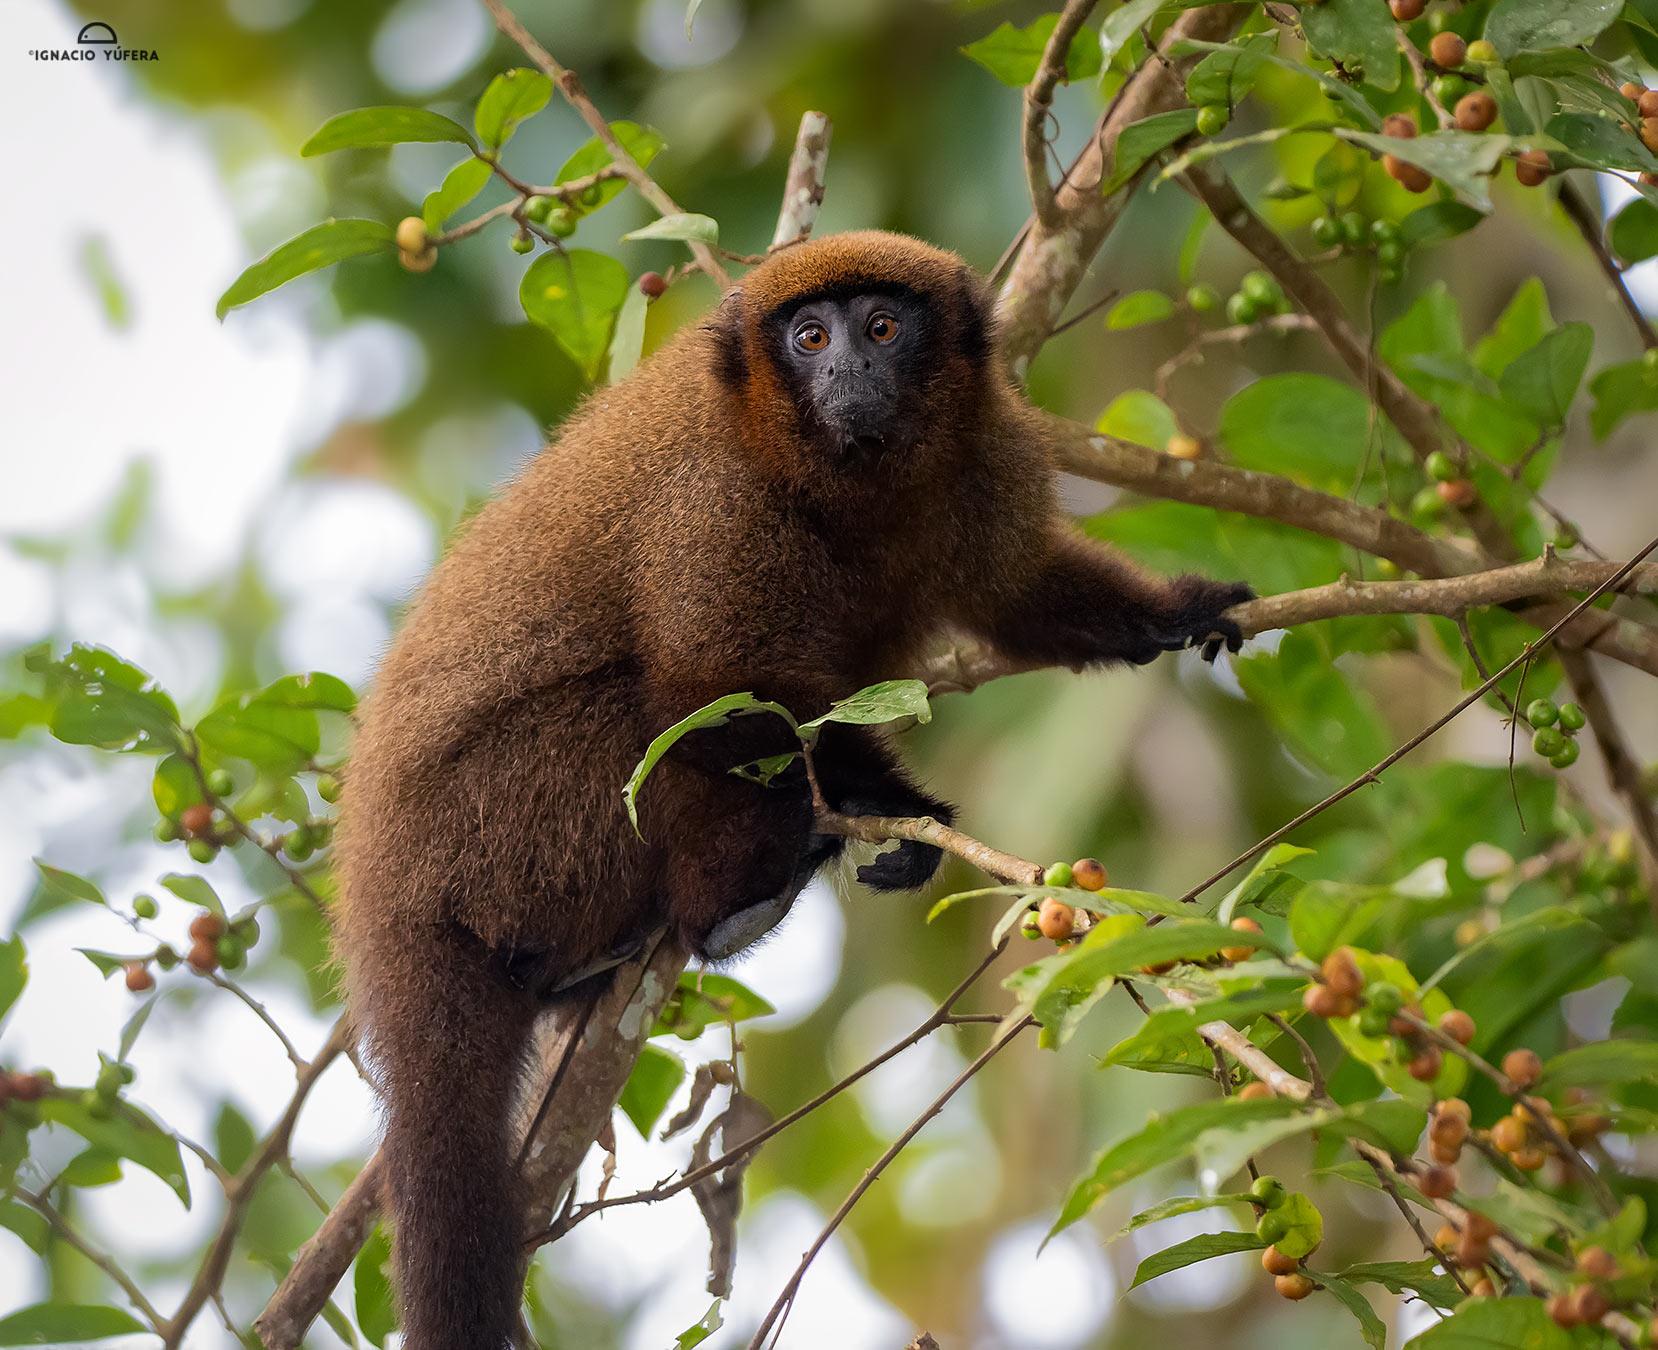 Brown Titi Monkey (Plecturocebus brunneus), Madre de Dios, Peru